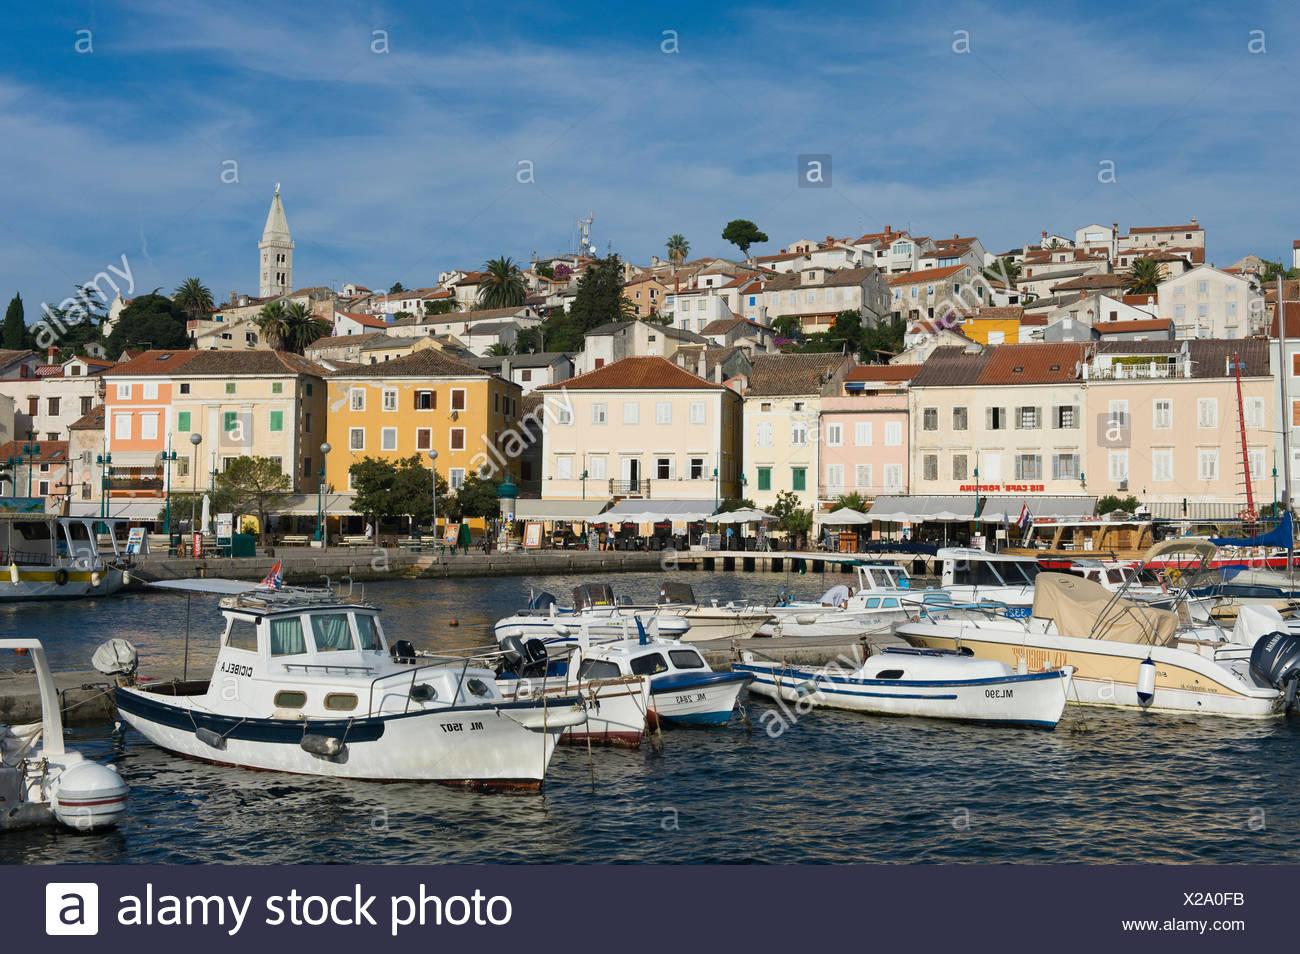 Boote im Hafen von Mali Losinj, Losinj Insel, Adria, Kvarner Bucht, Kroatien, Europa Stockbild